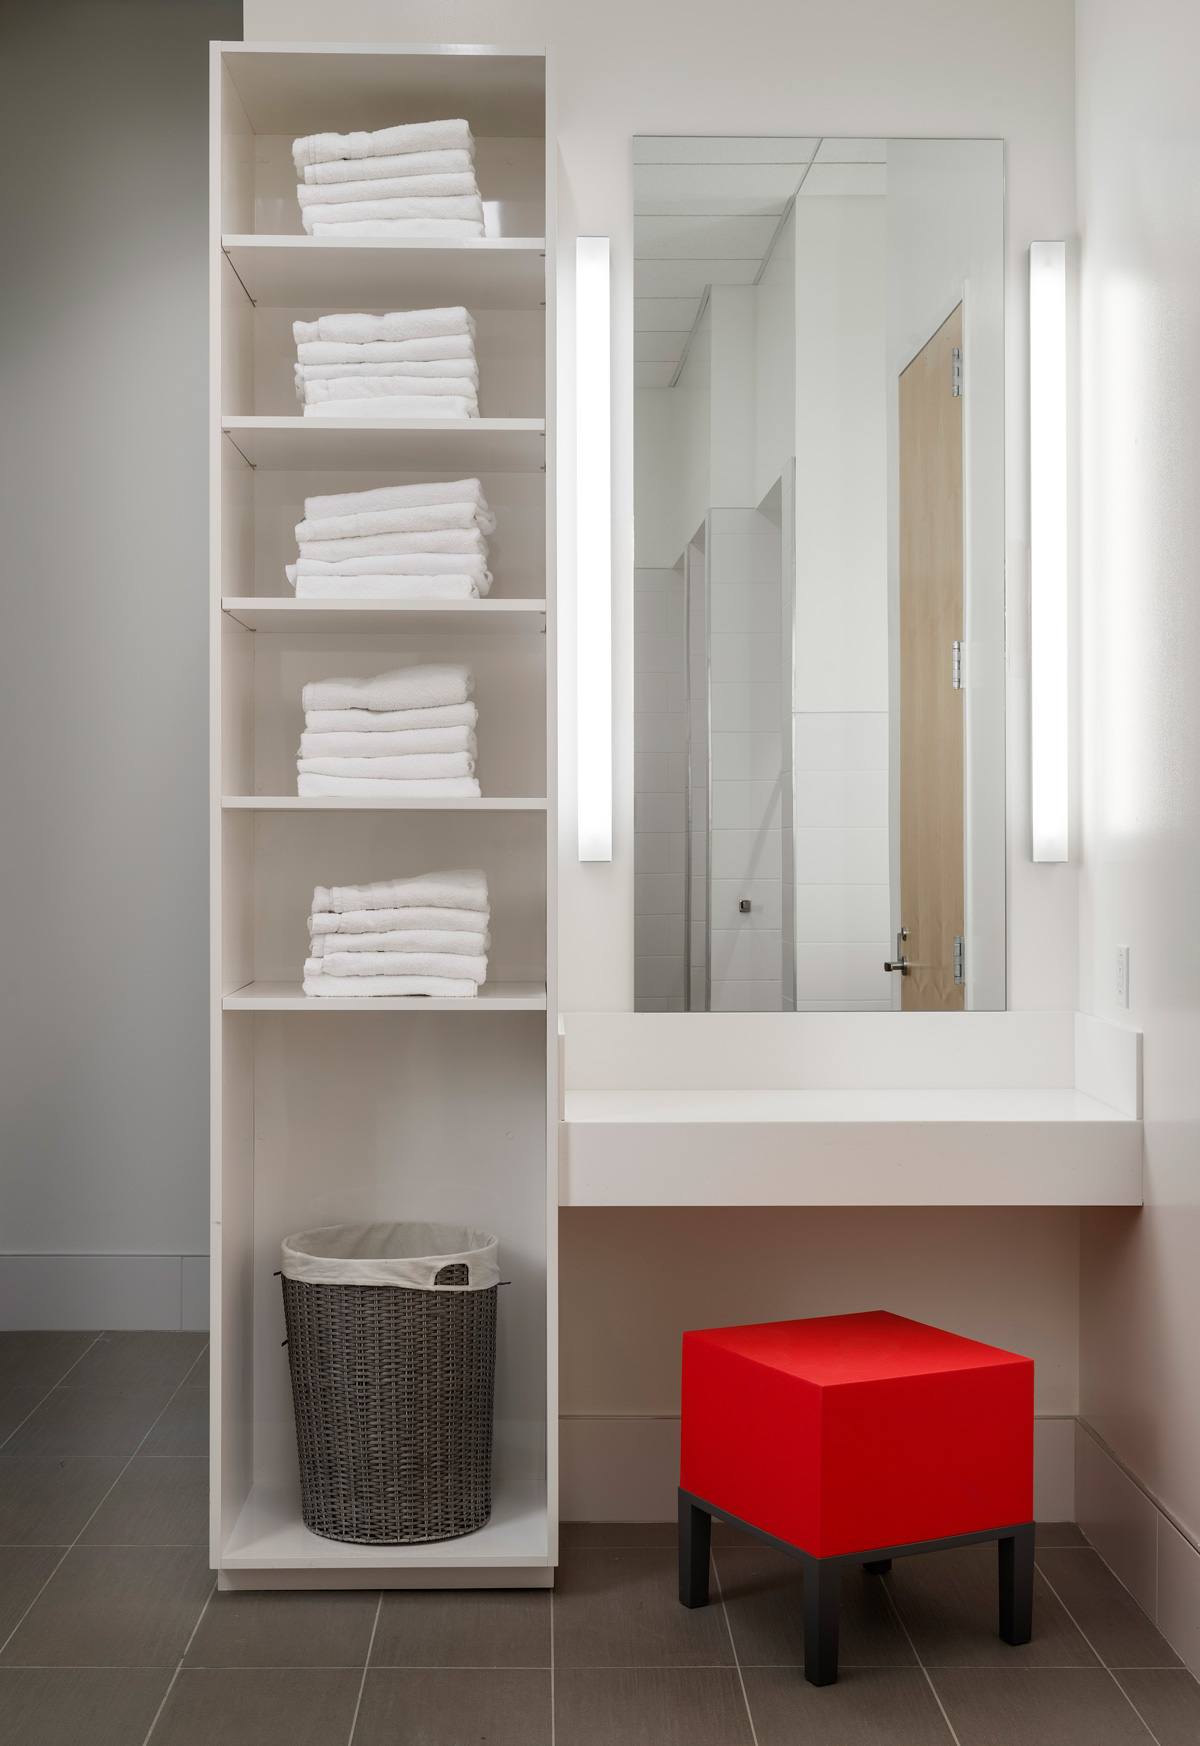 Hines PMO Seattle restroom vanity mirror